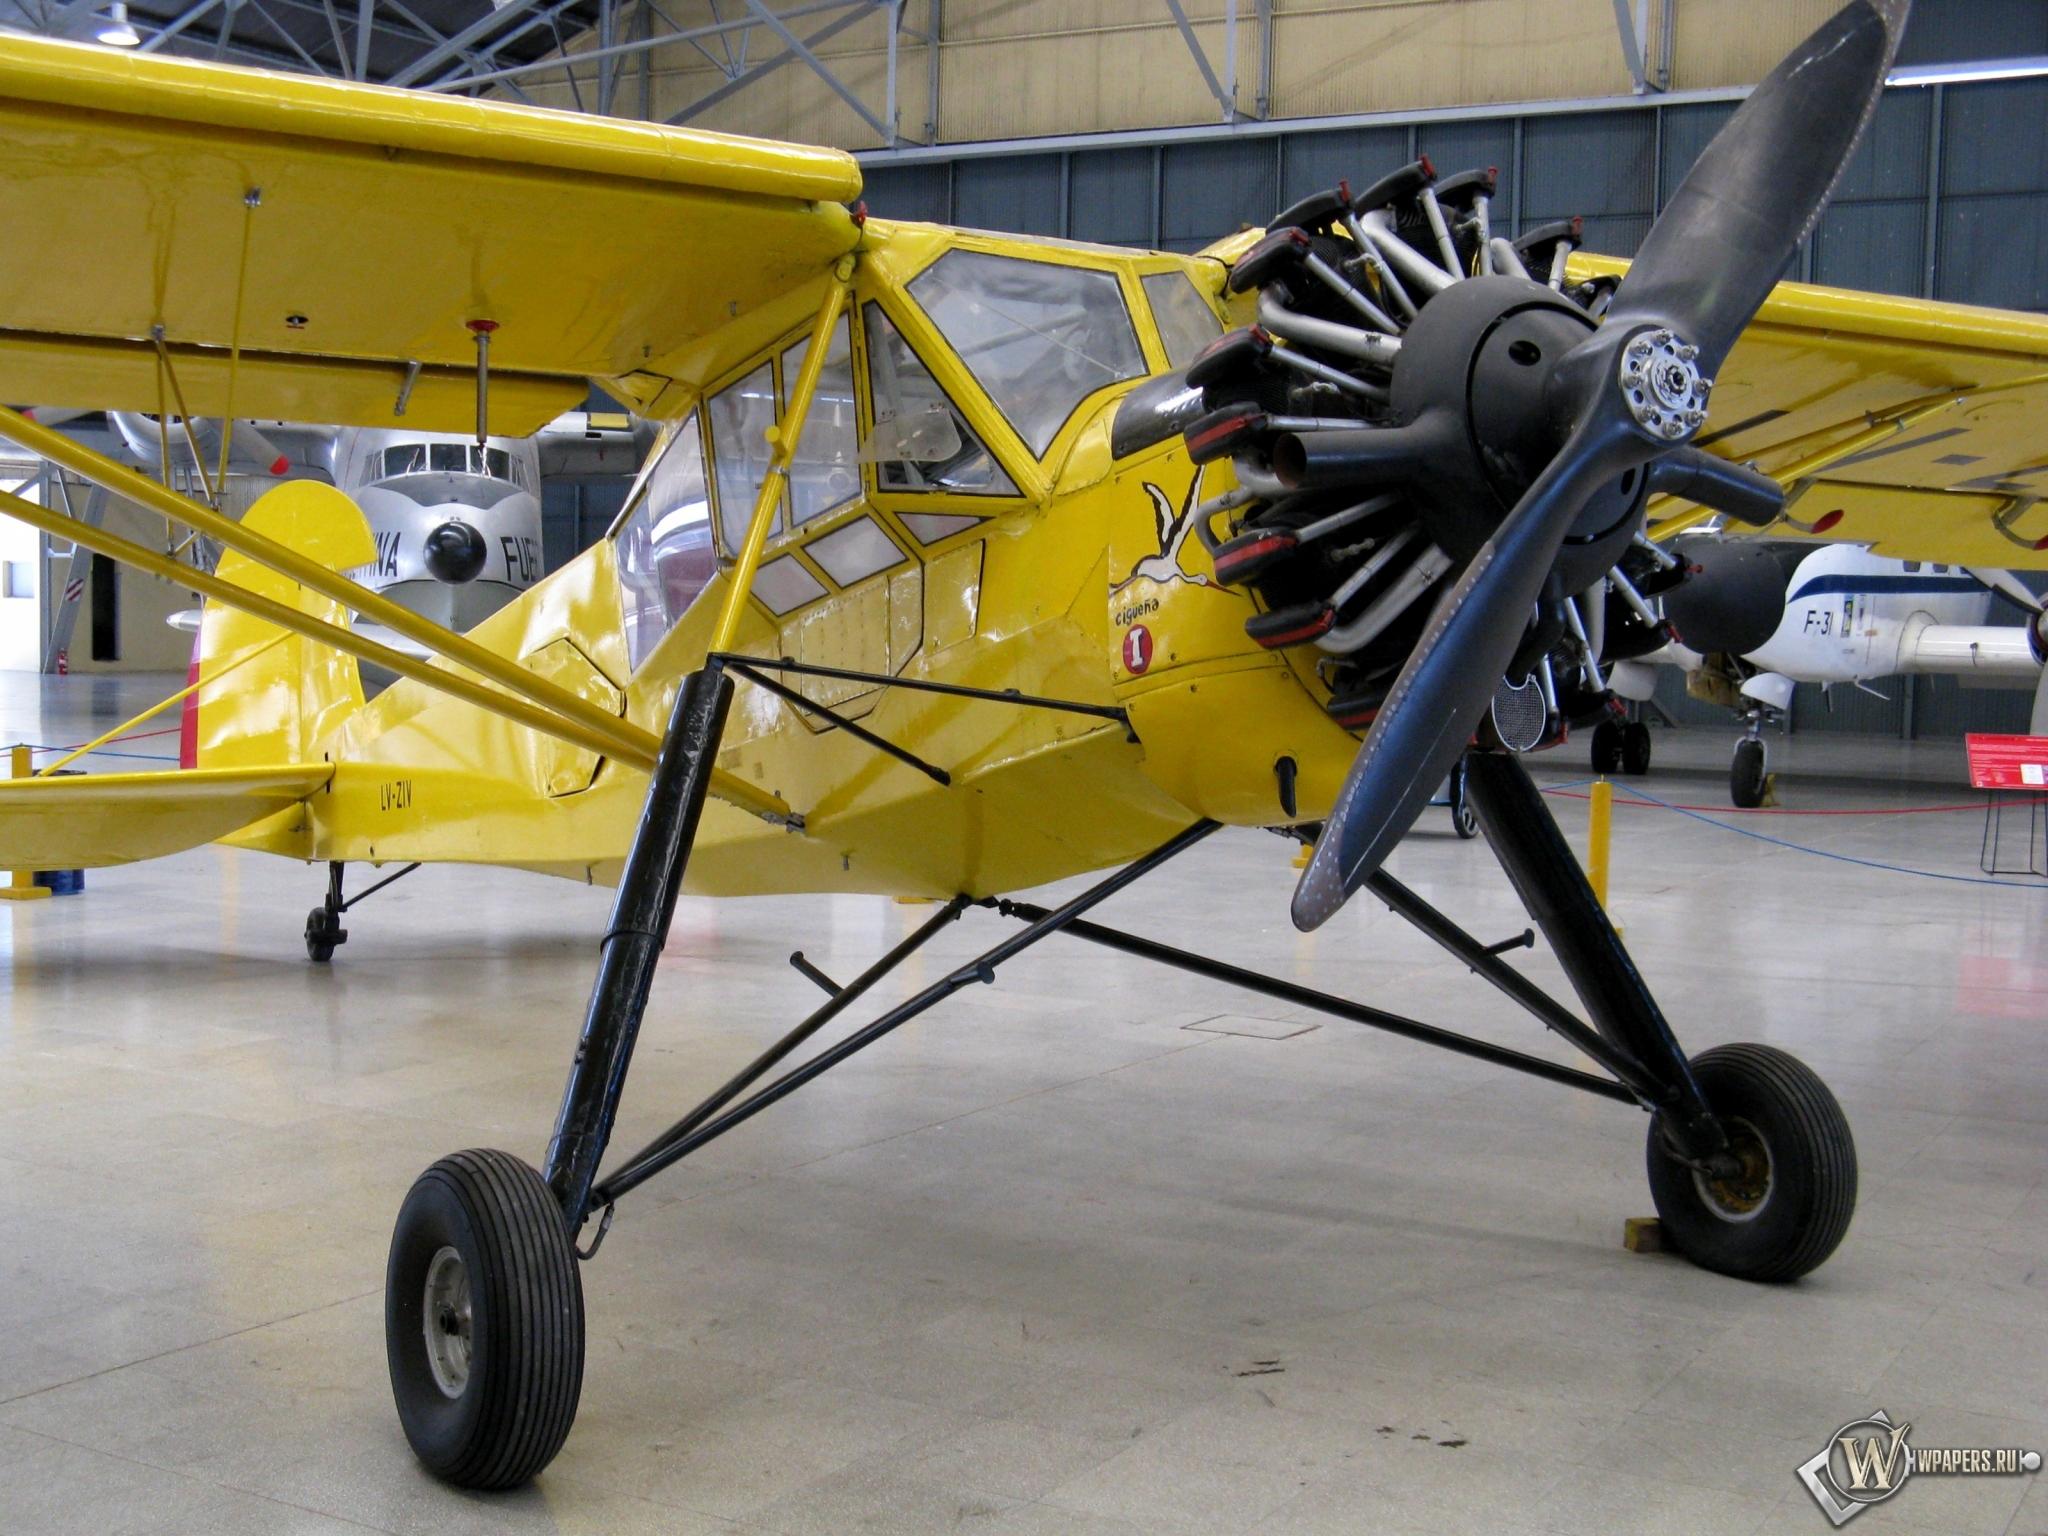 Fieseler Storch Fi-156 2048x1536